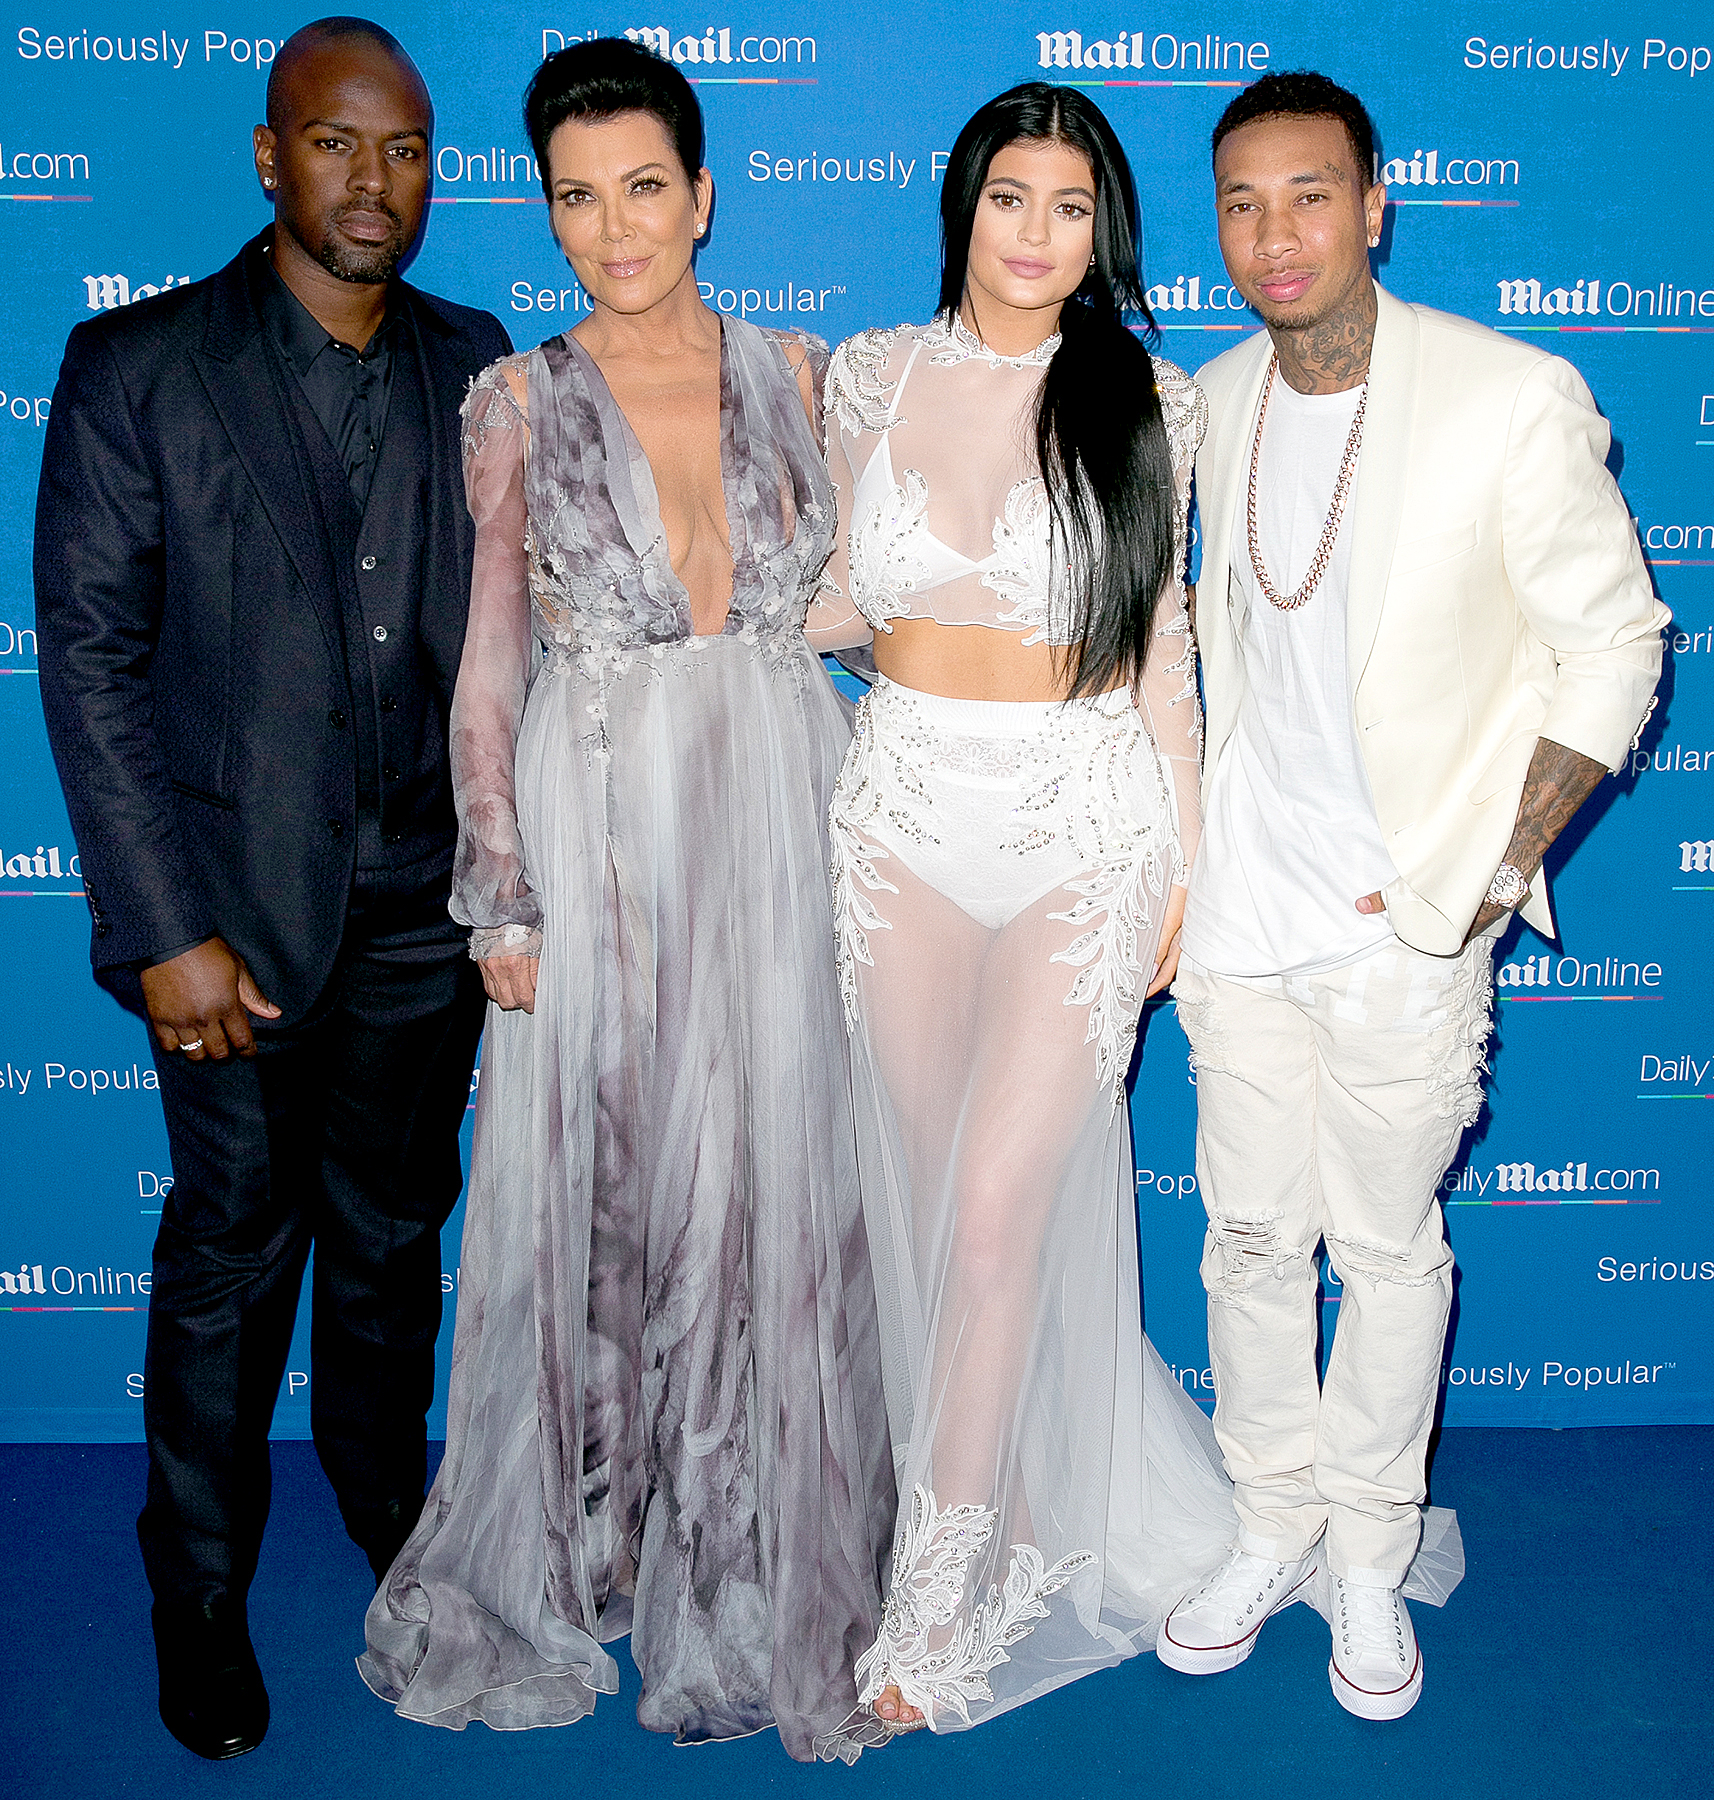 Corey Gamble, Kris Jenner, Kylie Jenner and Tyga